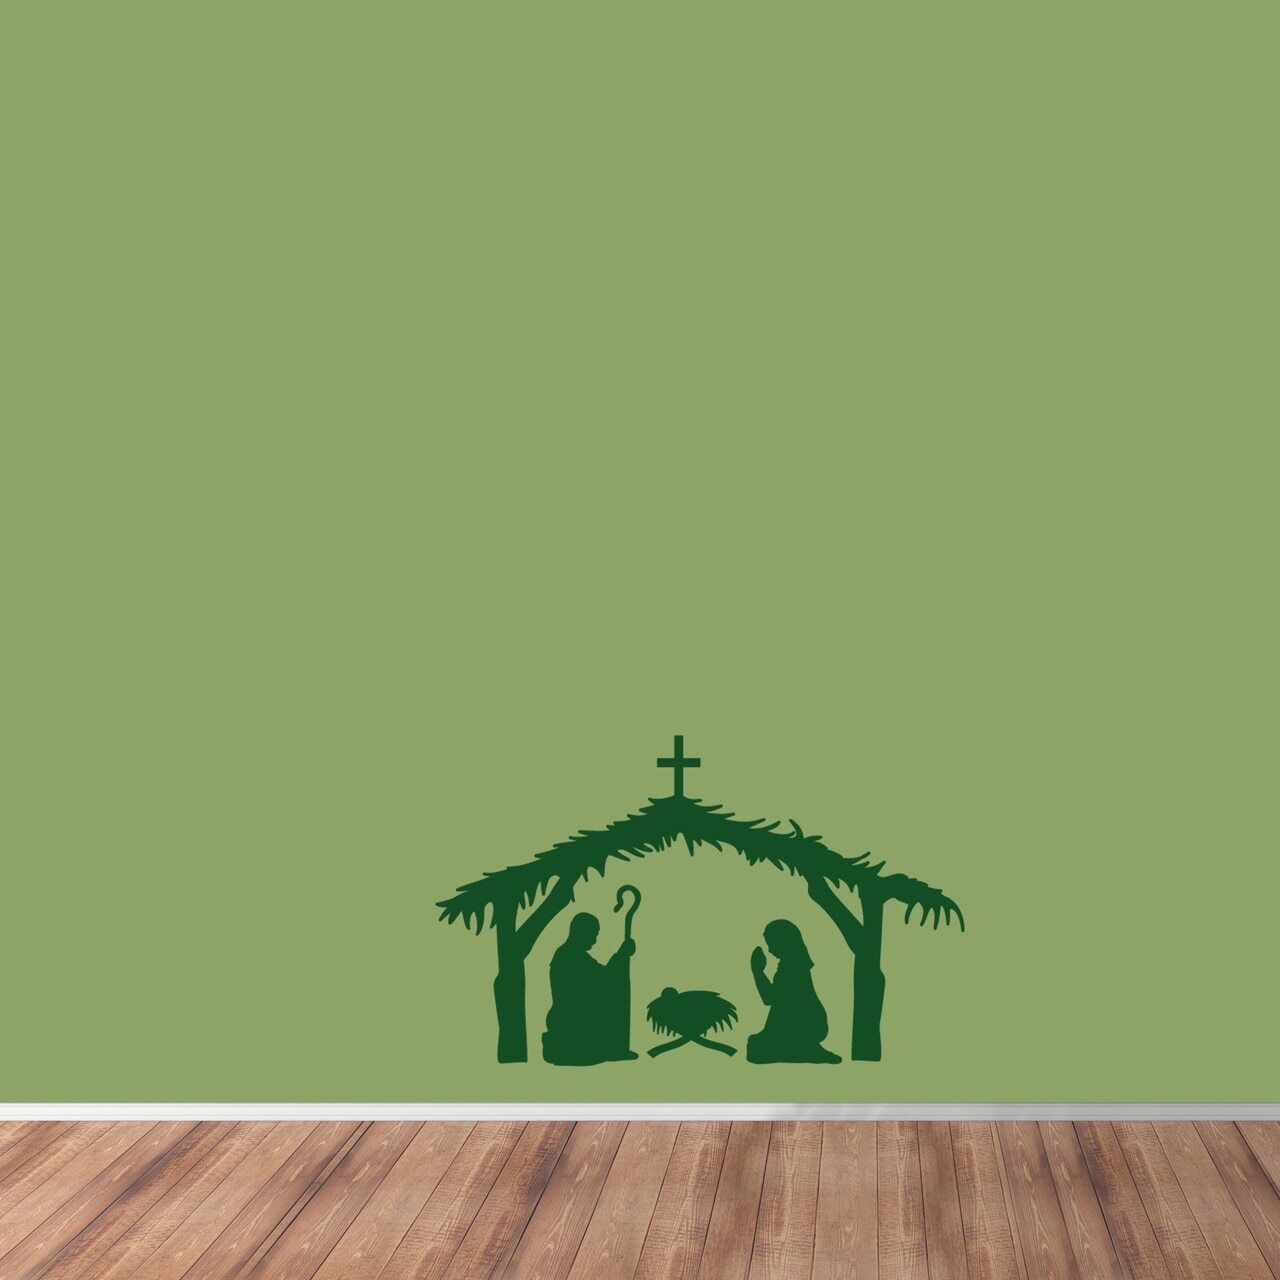 Nativity Scene Wall Decal - Christmas, Seasonal, Winter, Holiday, Spiritual